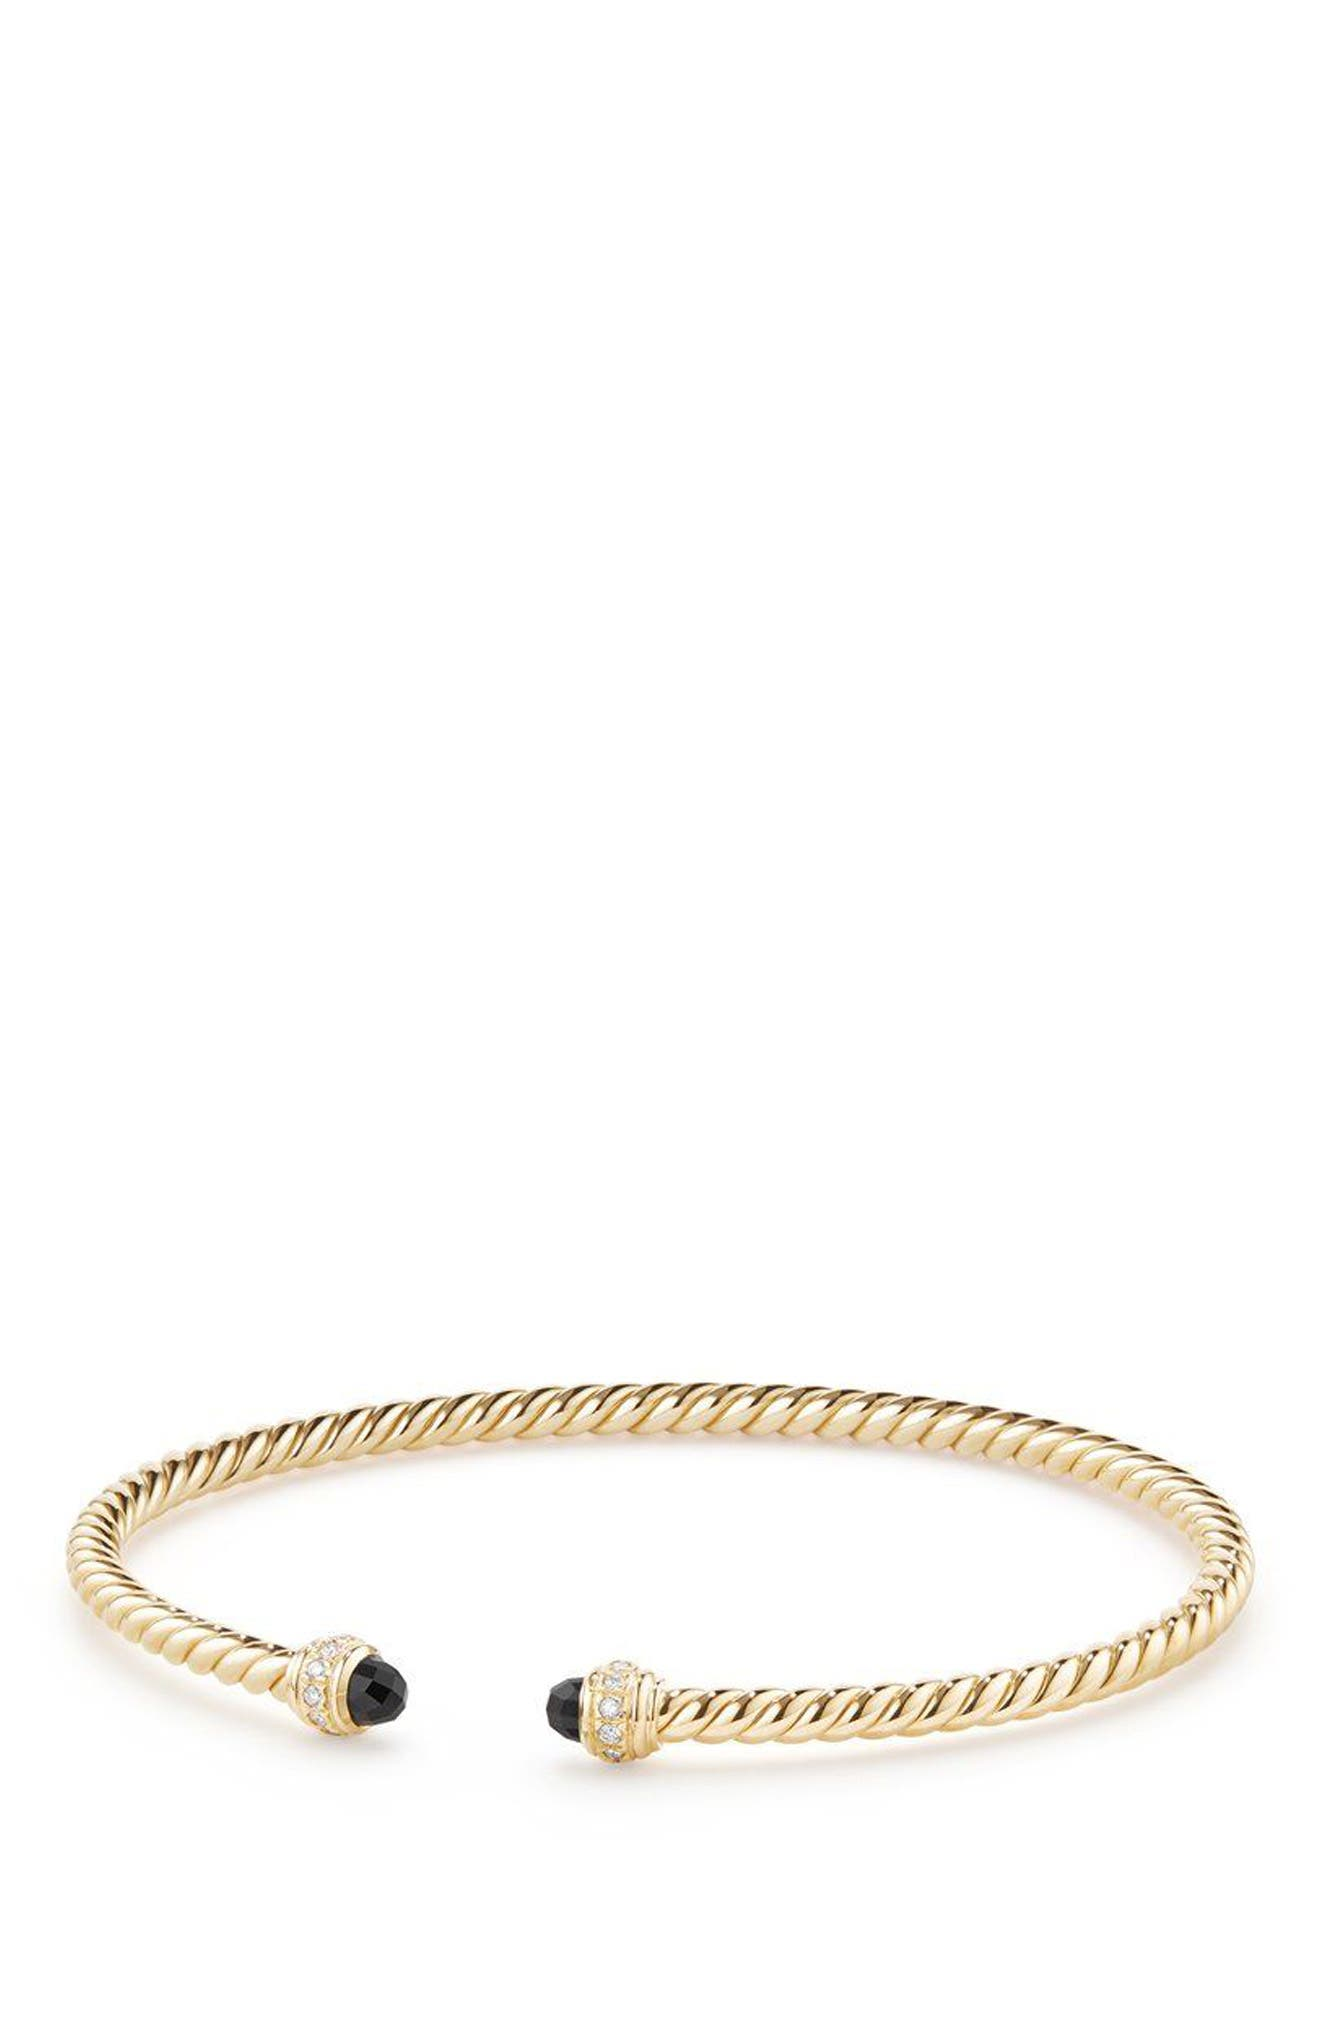 Main Image - David Yurman Cable Spira Bracelet in 18K Gold with Diamonds, 3mm